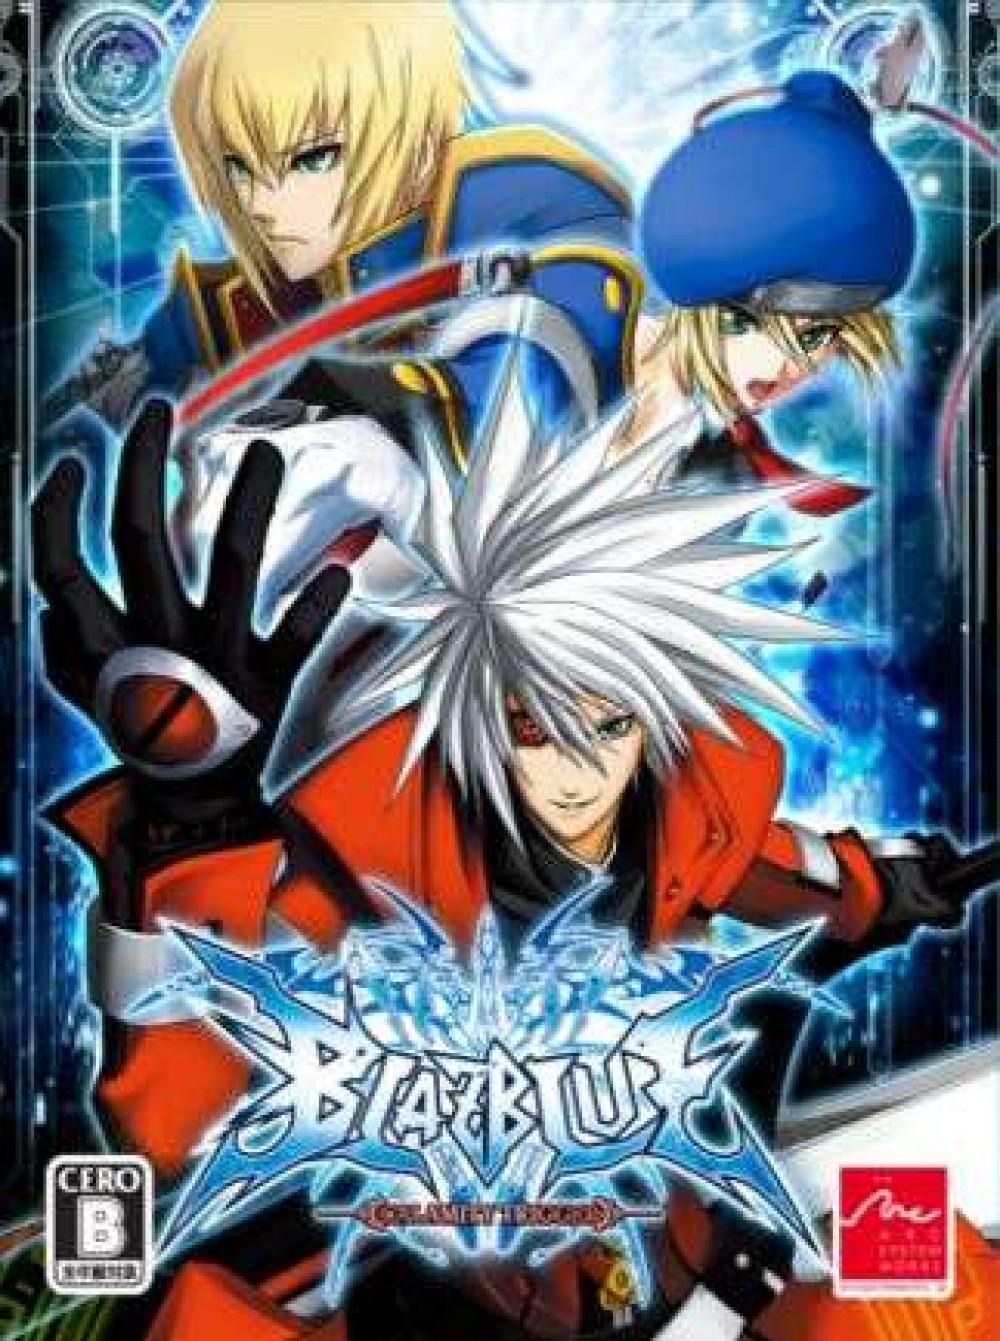 PS3 BLAZBLUE CALAMITY TRIGGER (Japanese version)